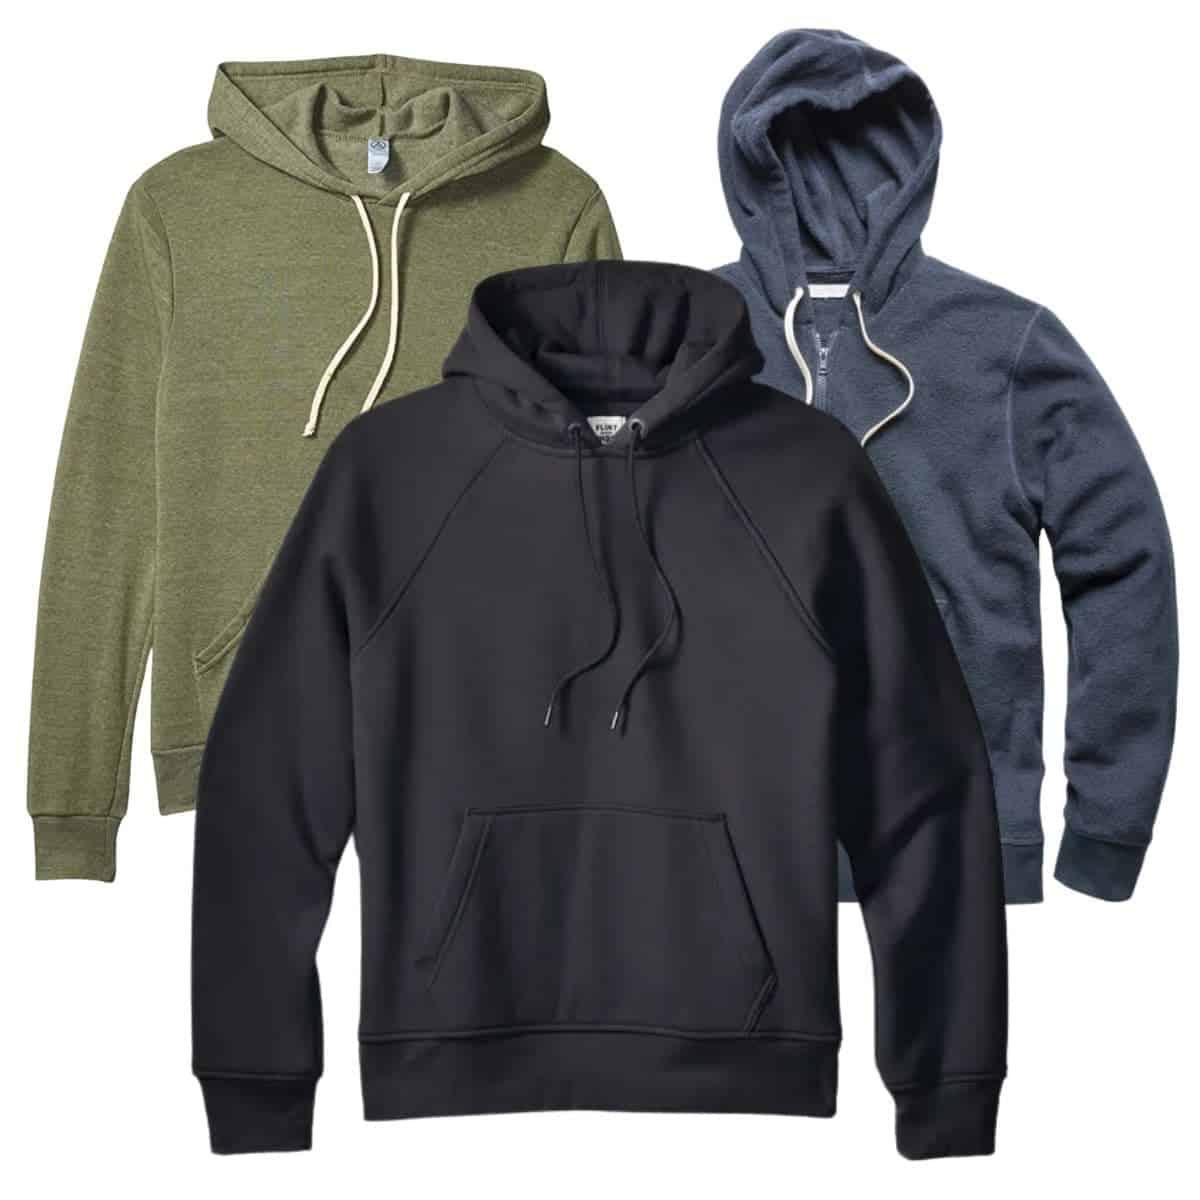 Three hoodies.